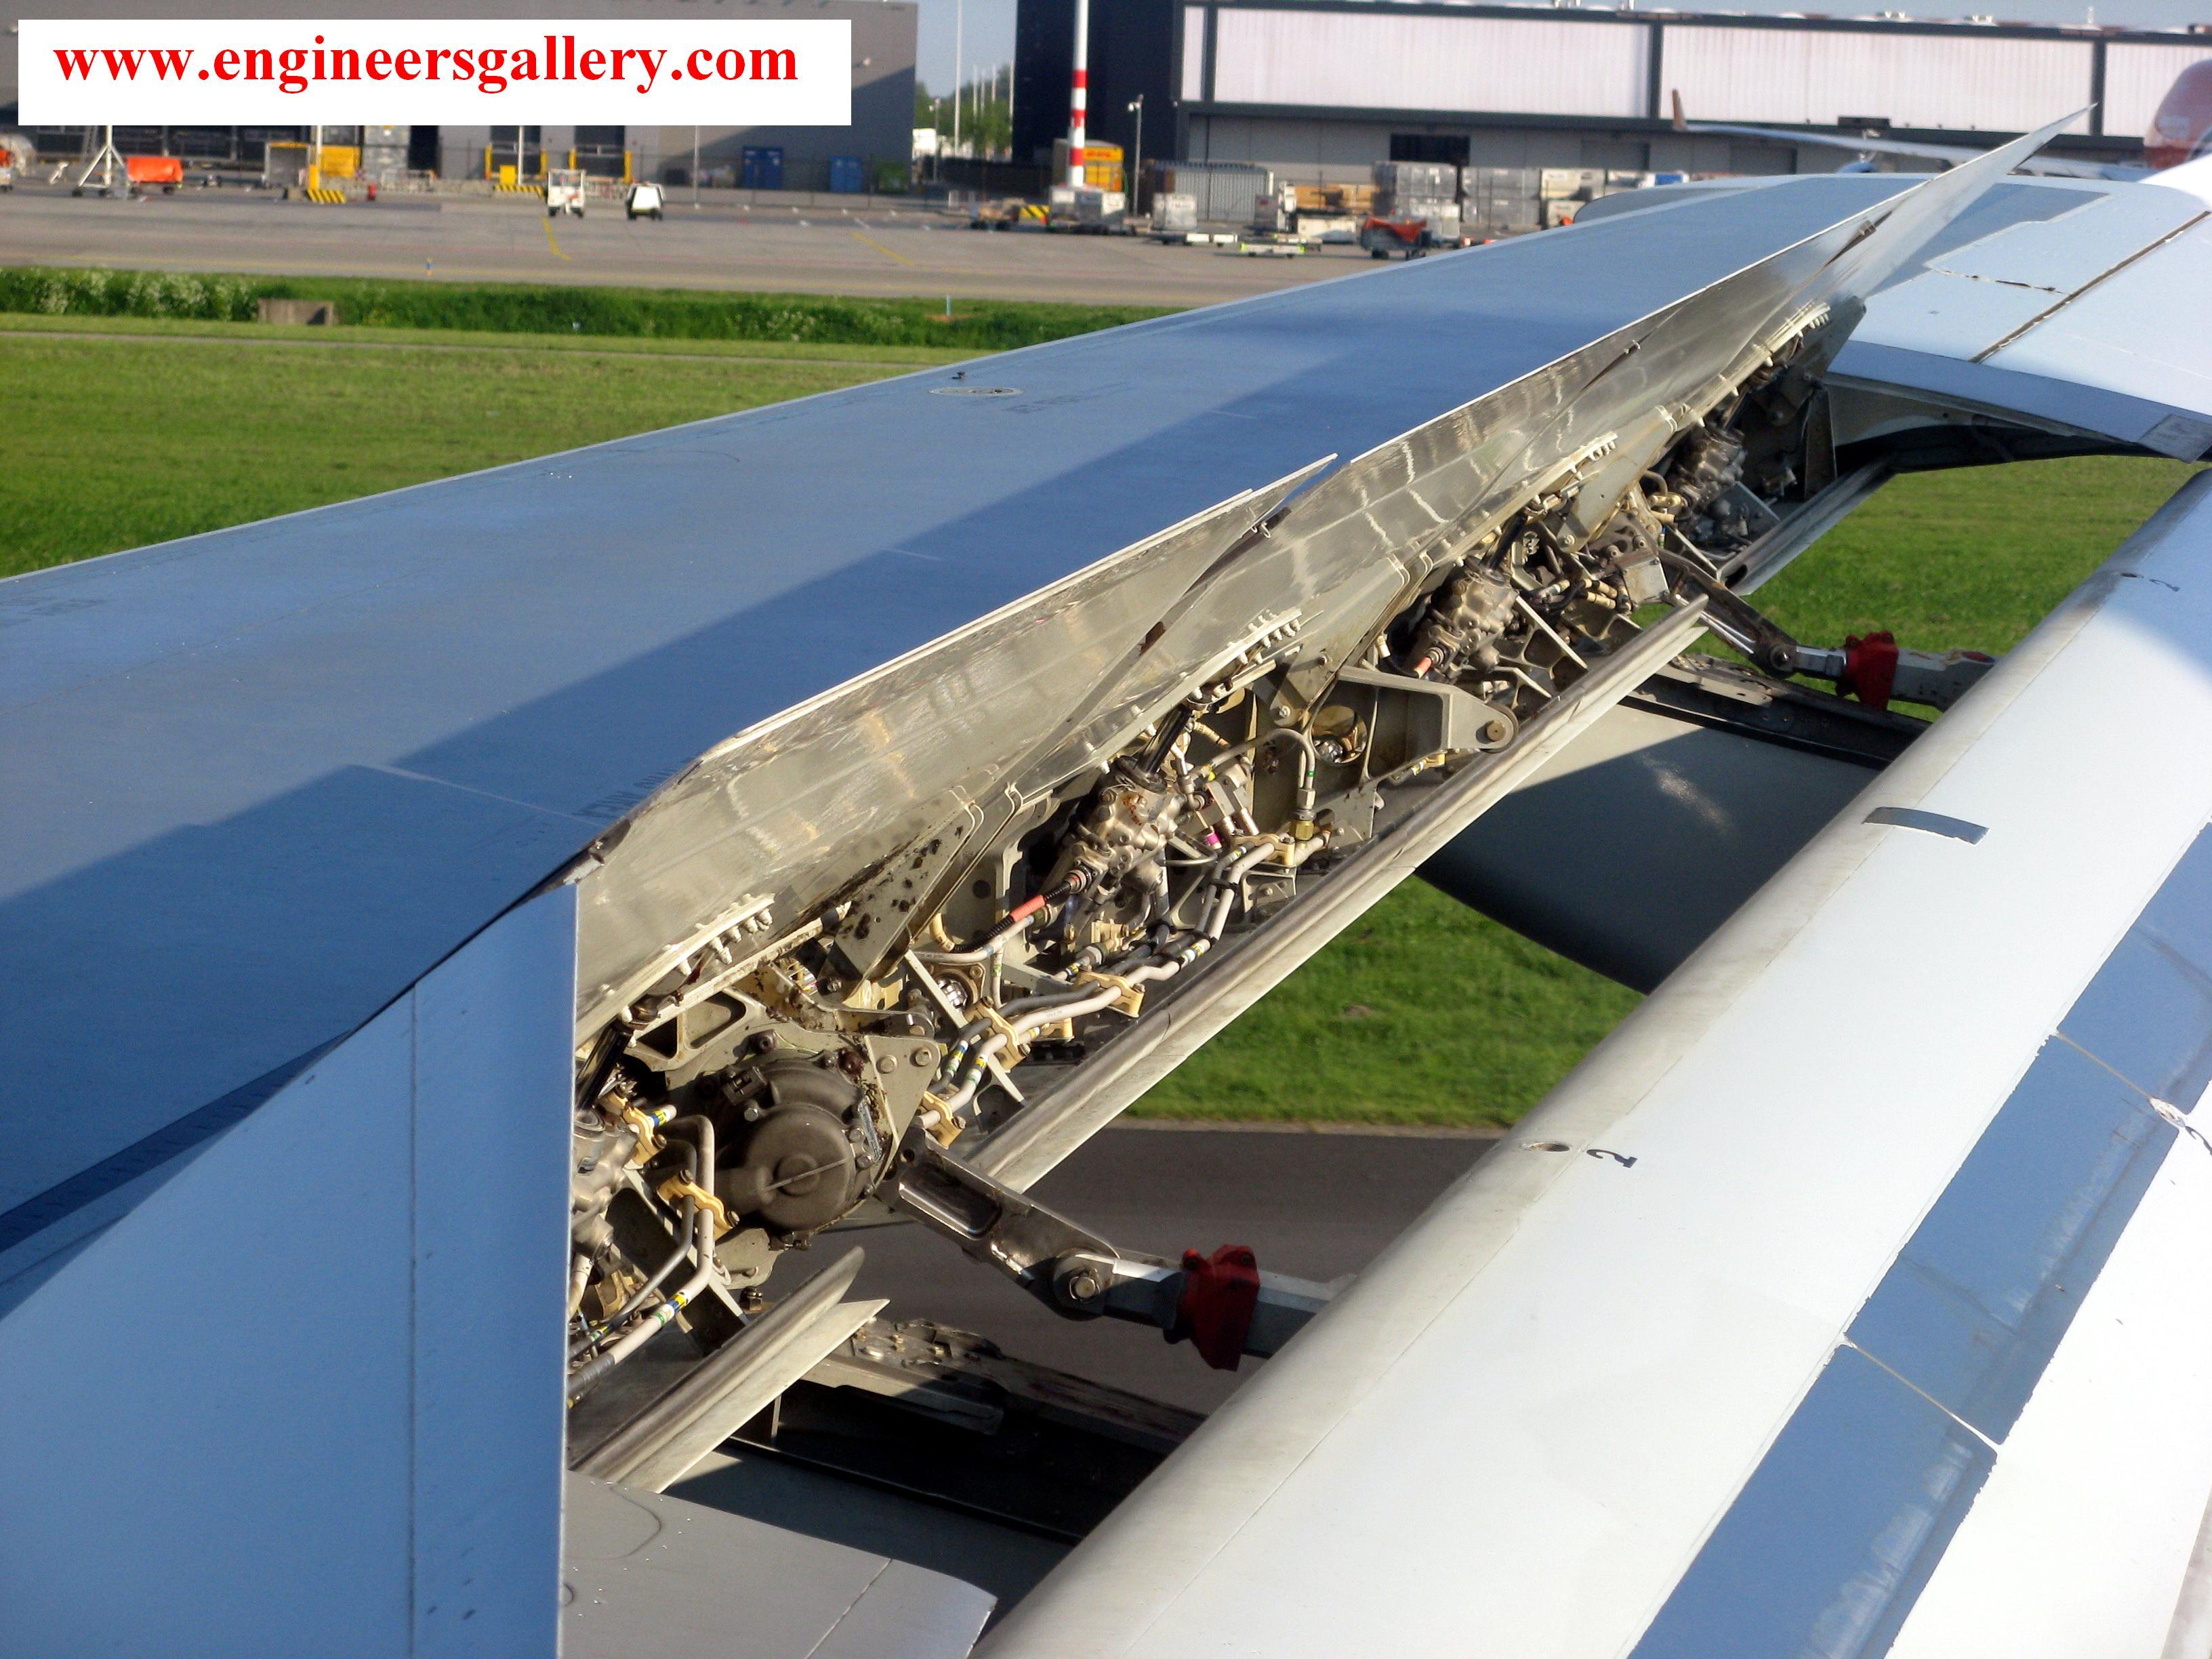 us army technical manual aviation unit maintenance avum and aviation intermediate maintenance avim manual for general aircraft maintenance nondestructive volume 7 tm 1 1500 204 23 7 1992